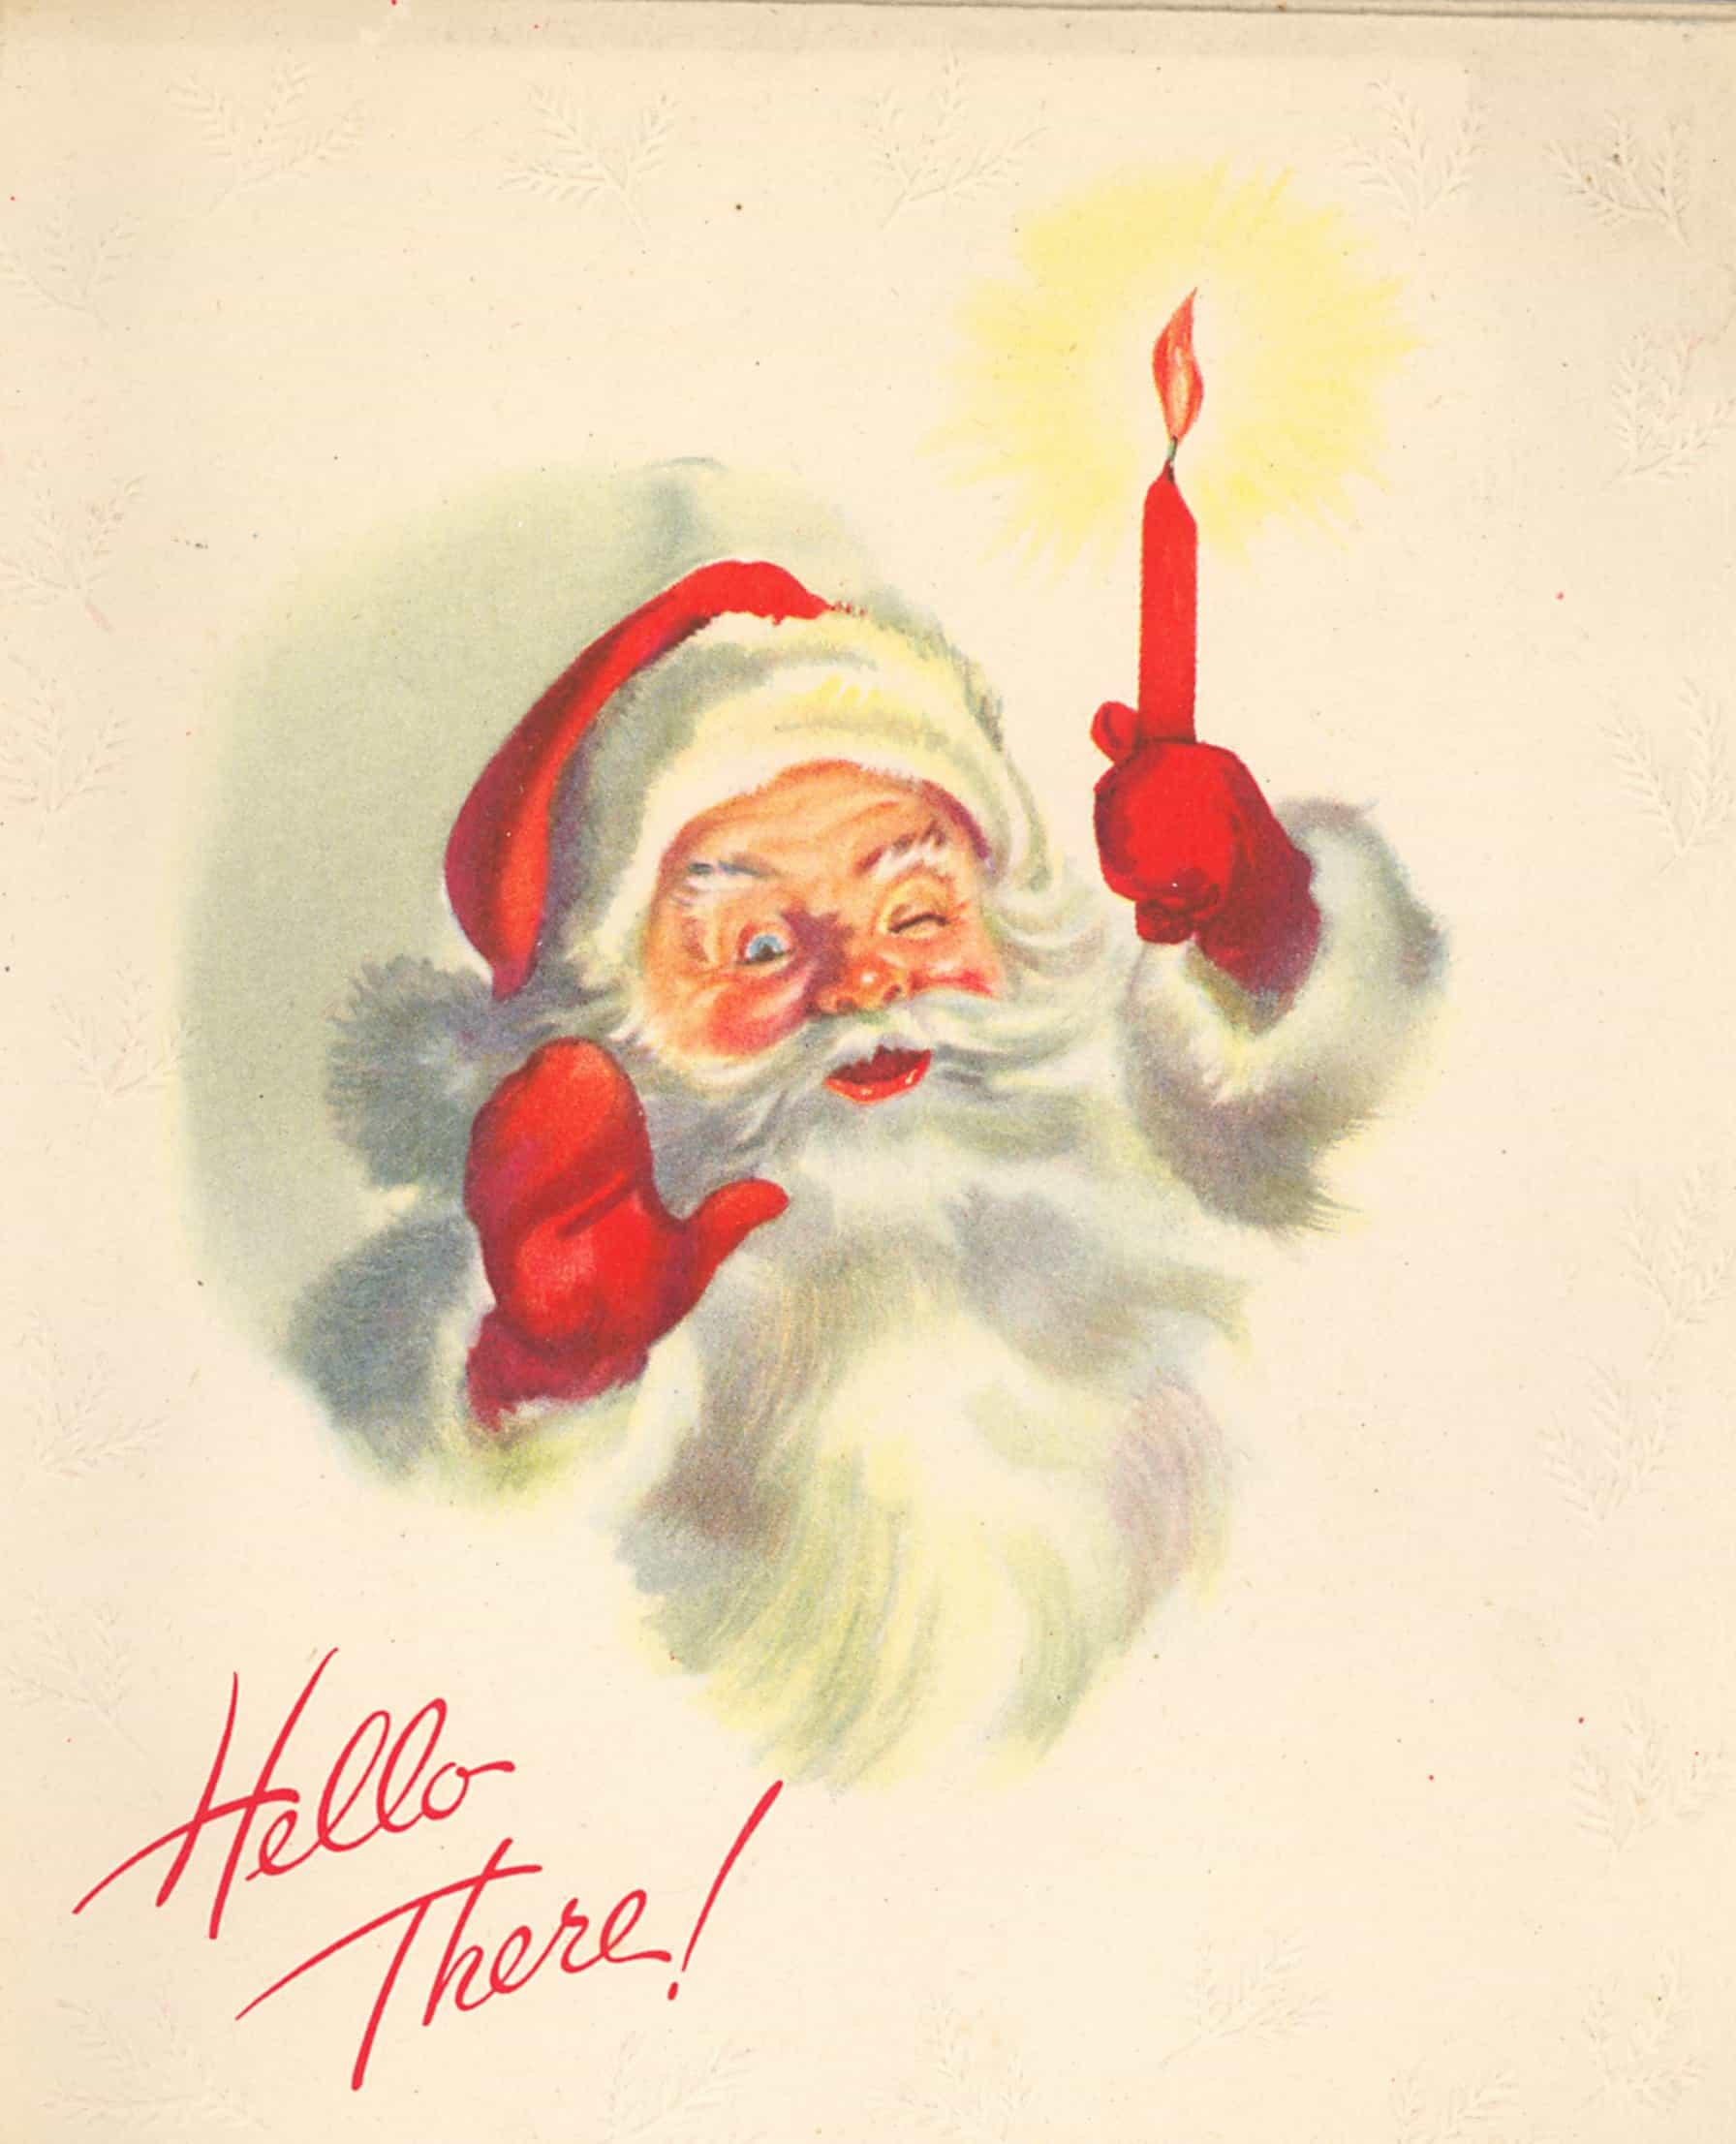 Christmas Clipart Santa.Hello There Santa Claus Vintage Christmas Clipart